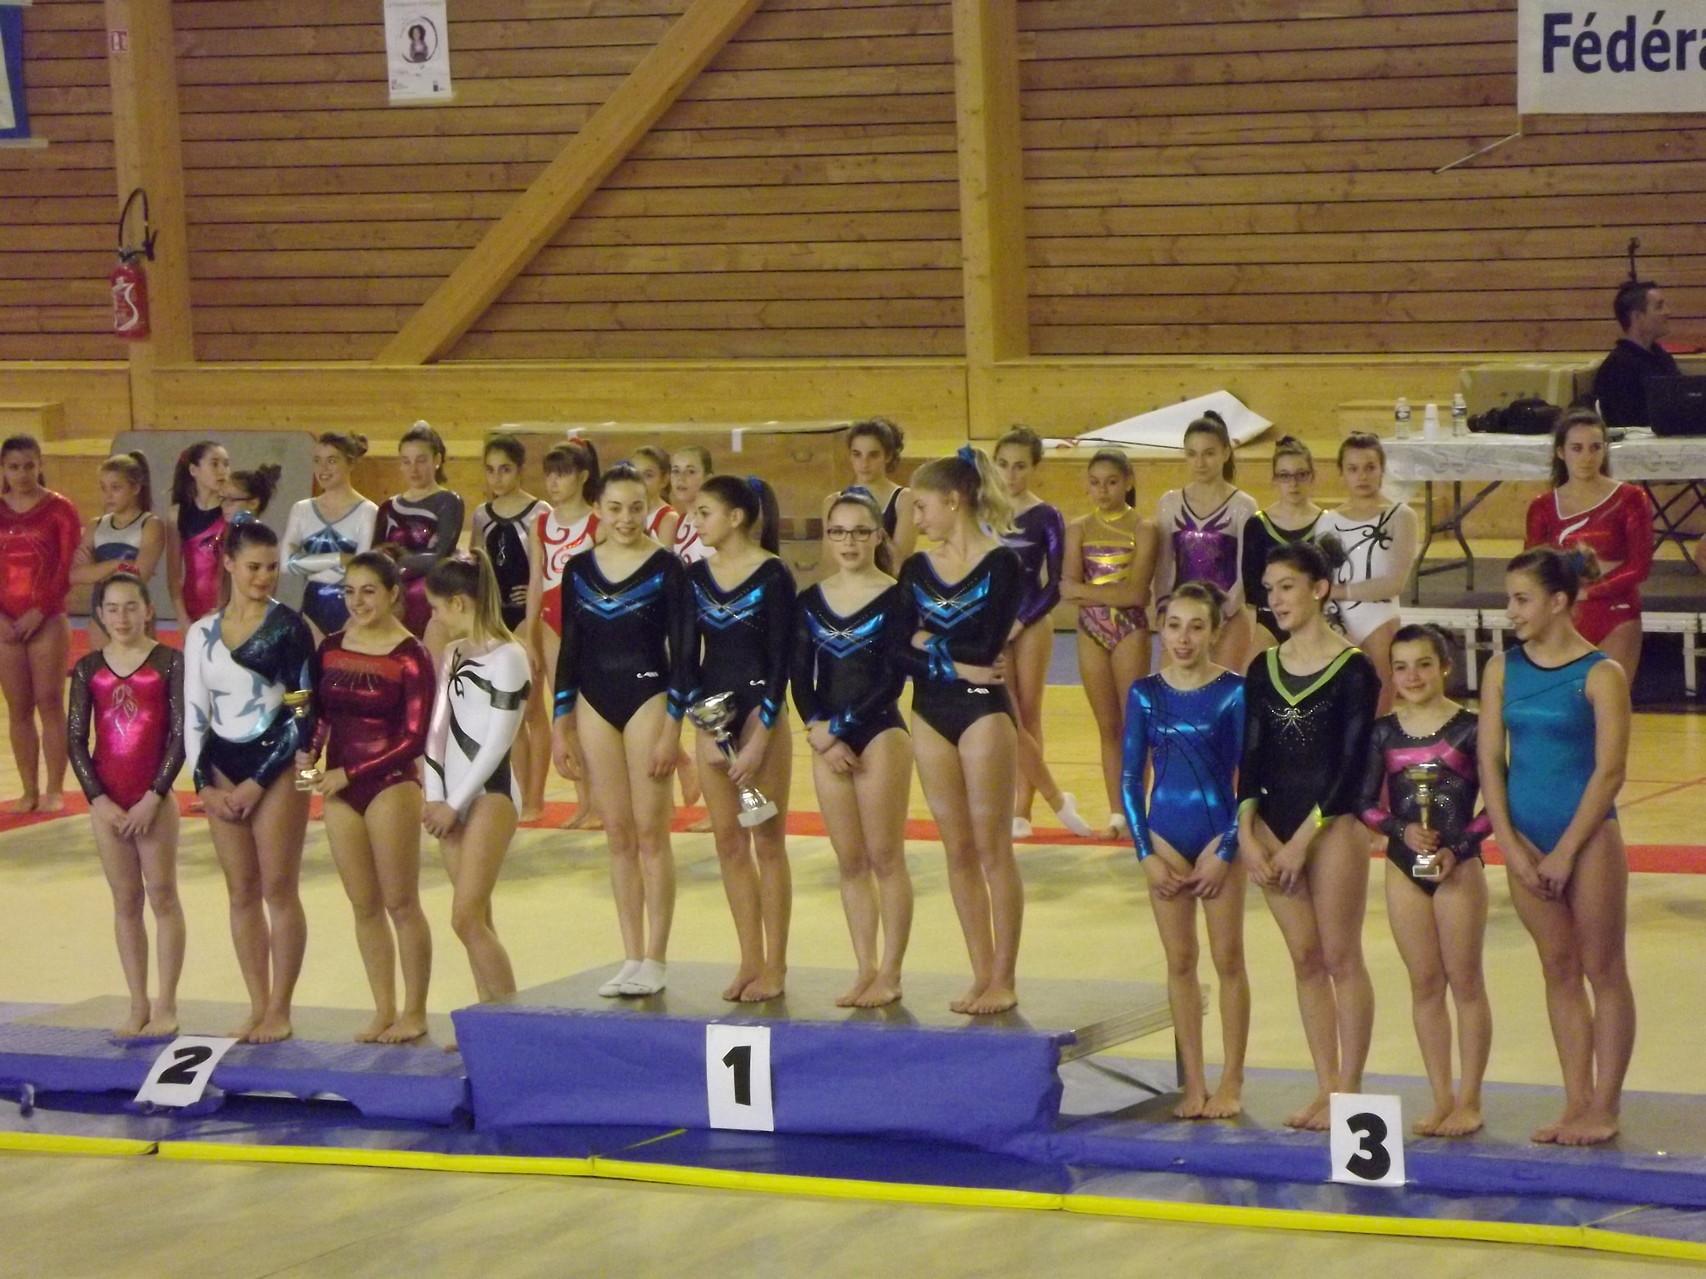 podium équipe d'associatiopn espoir: envolée 2ème